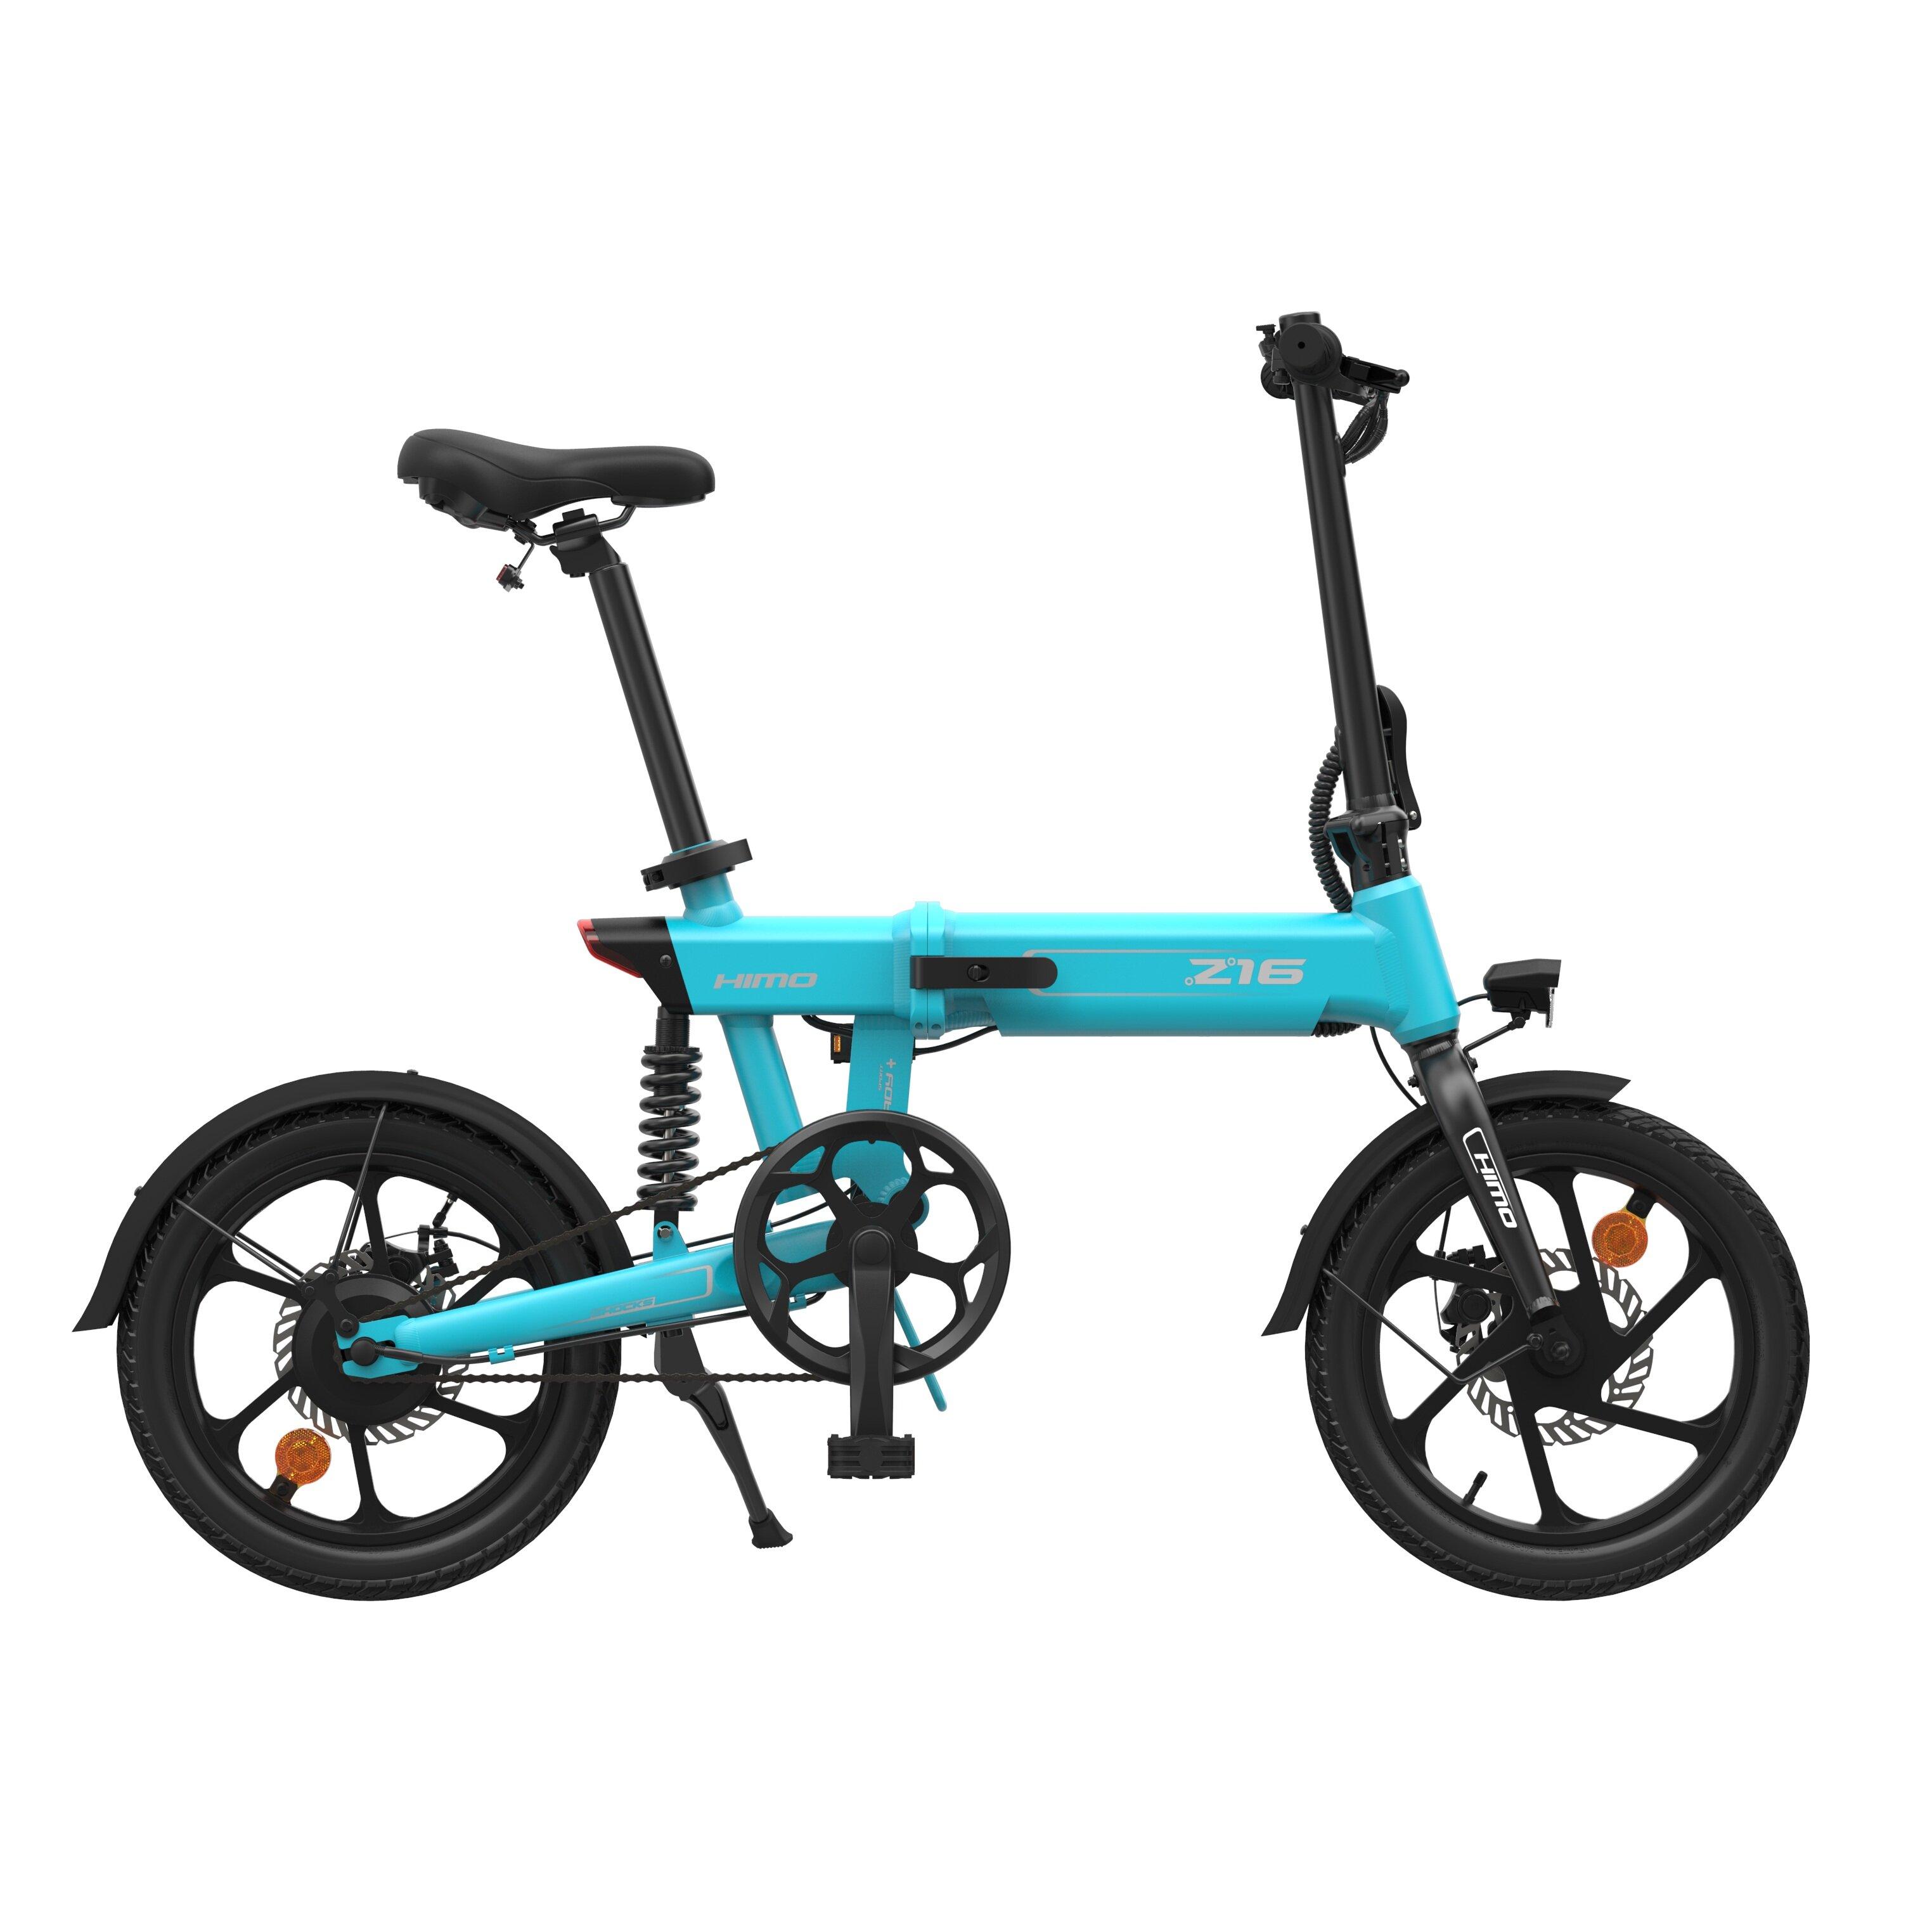 [EU Direct] HIMO Z16 10Ah 36V 250W Moped Electric Bike Folding Bike 25km/h Max Speed 80km Mileage Max Load 100kg 3 Modes Youpin